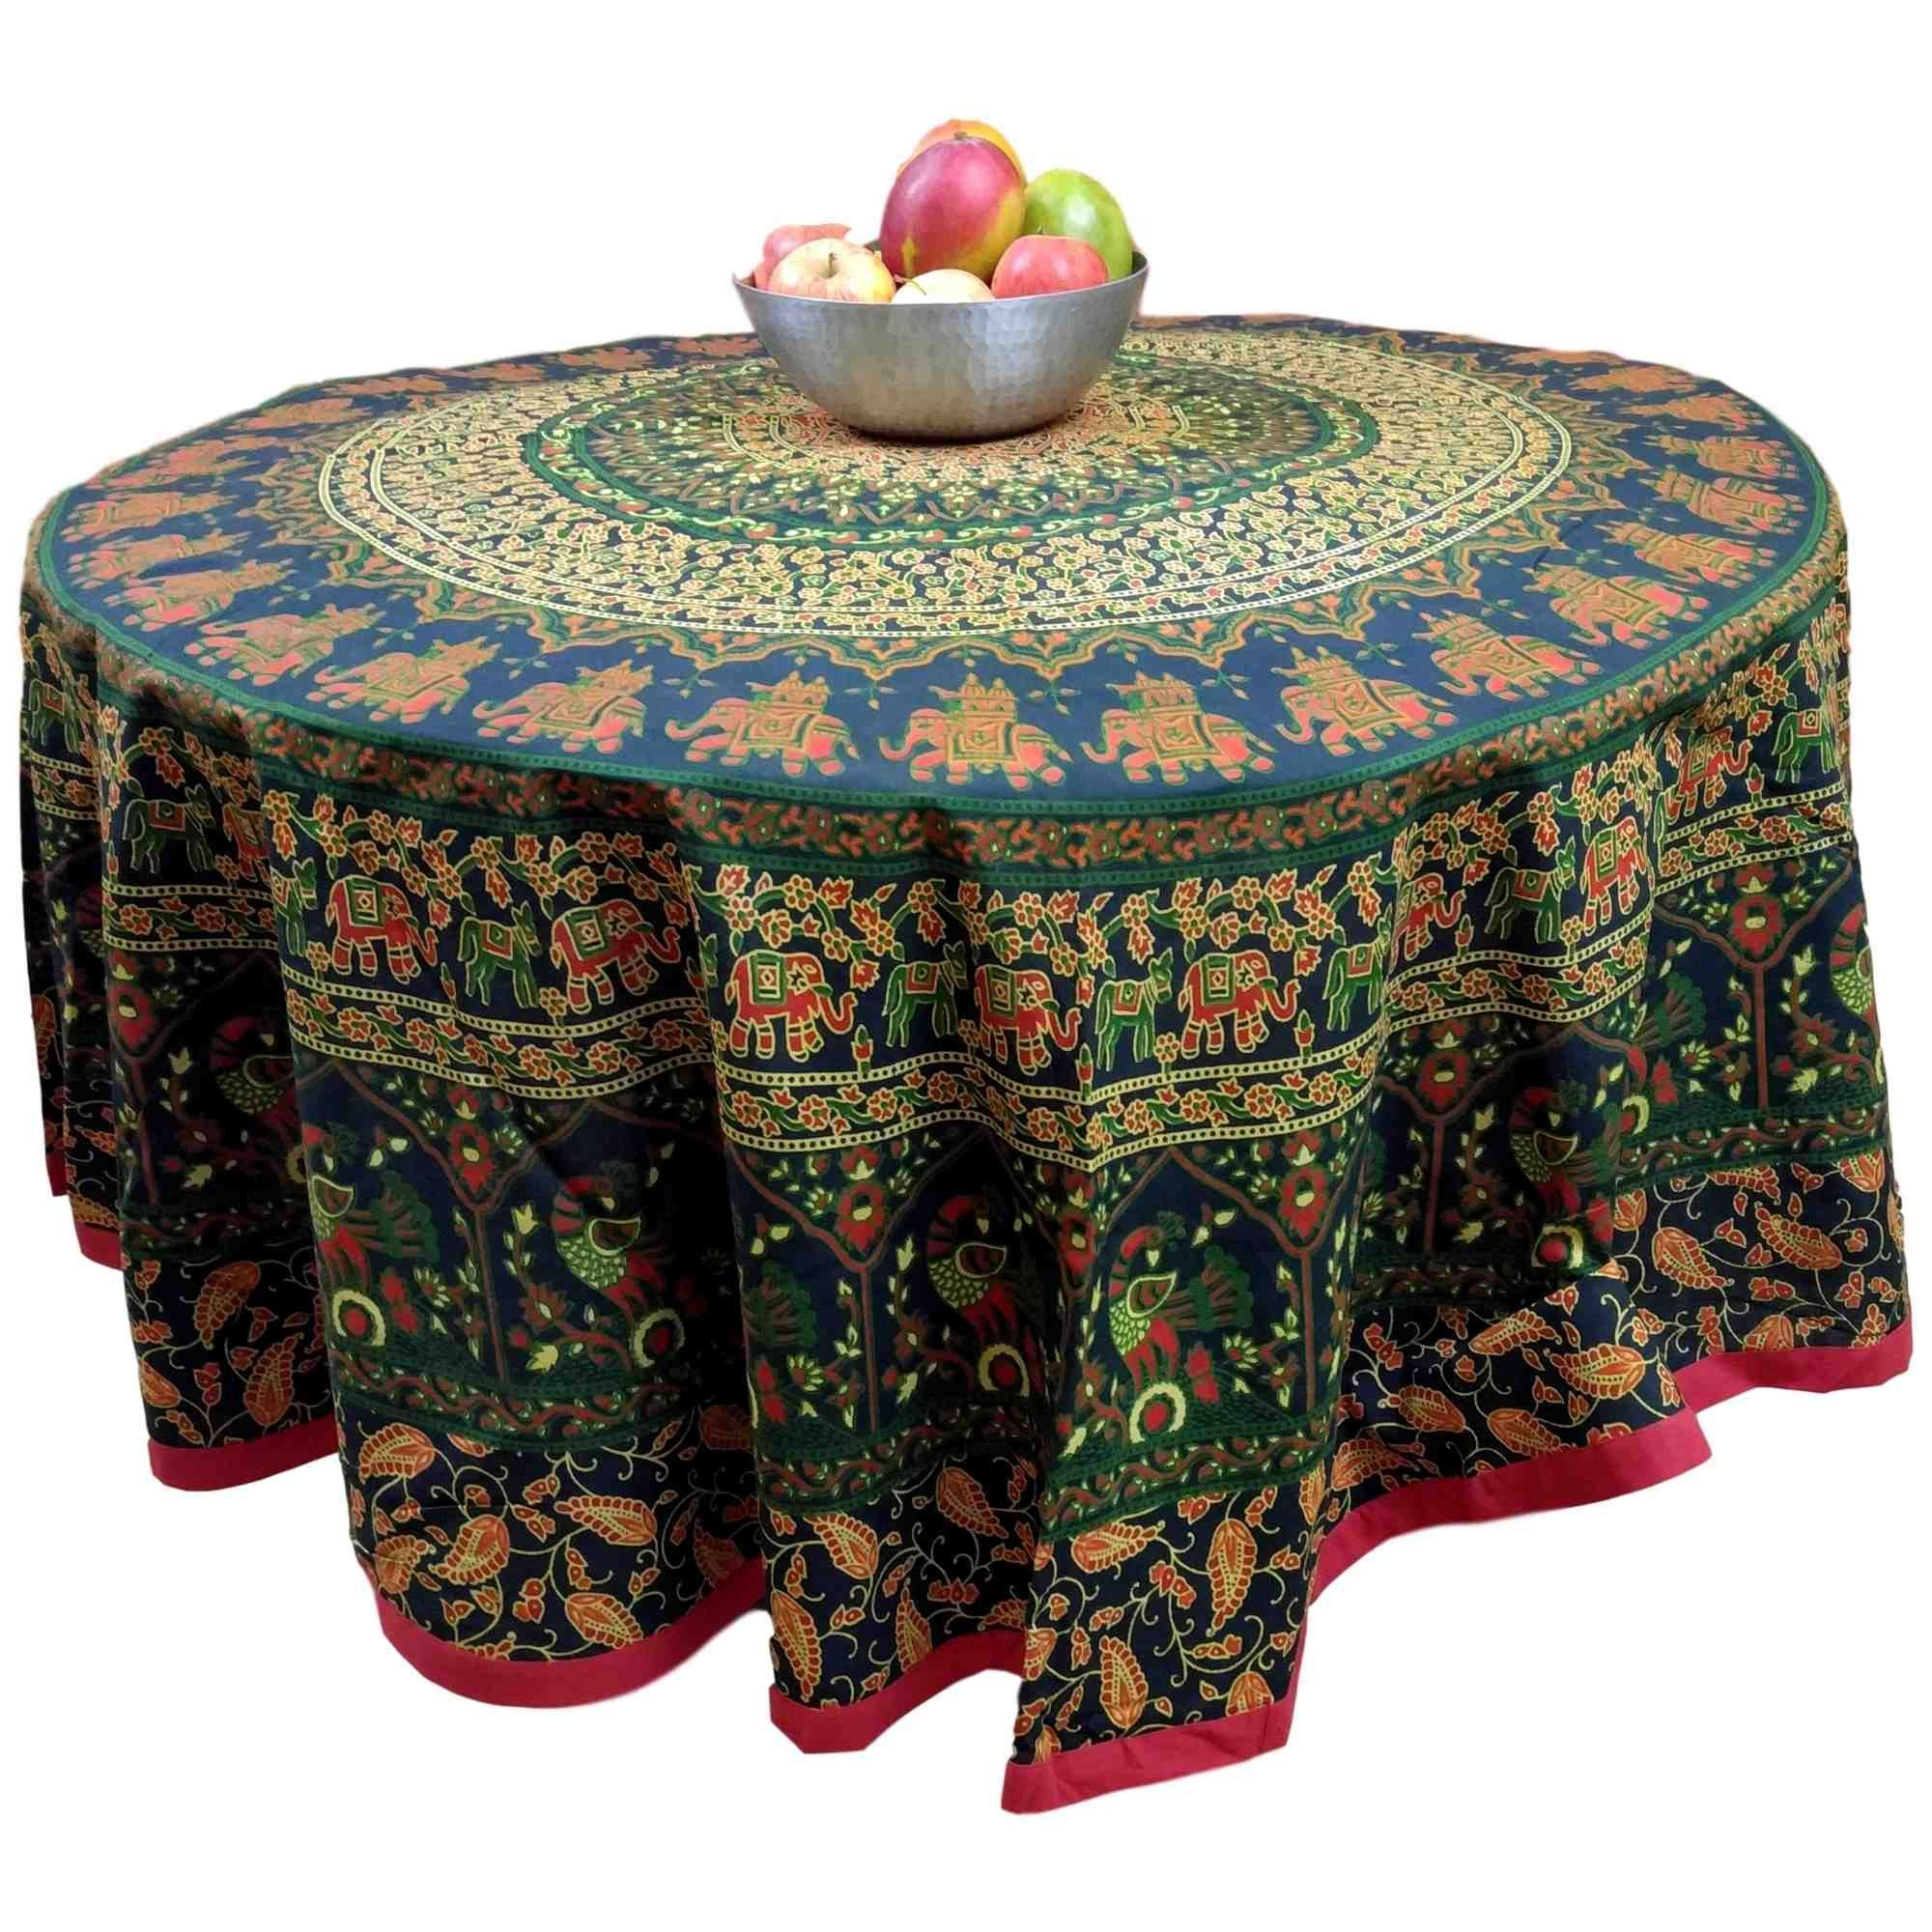 Handmade cotton elephant mandala floral